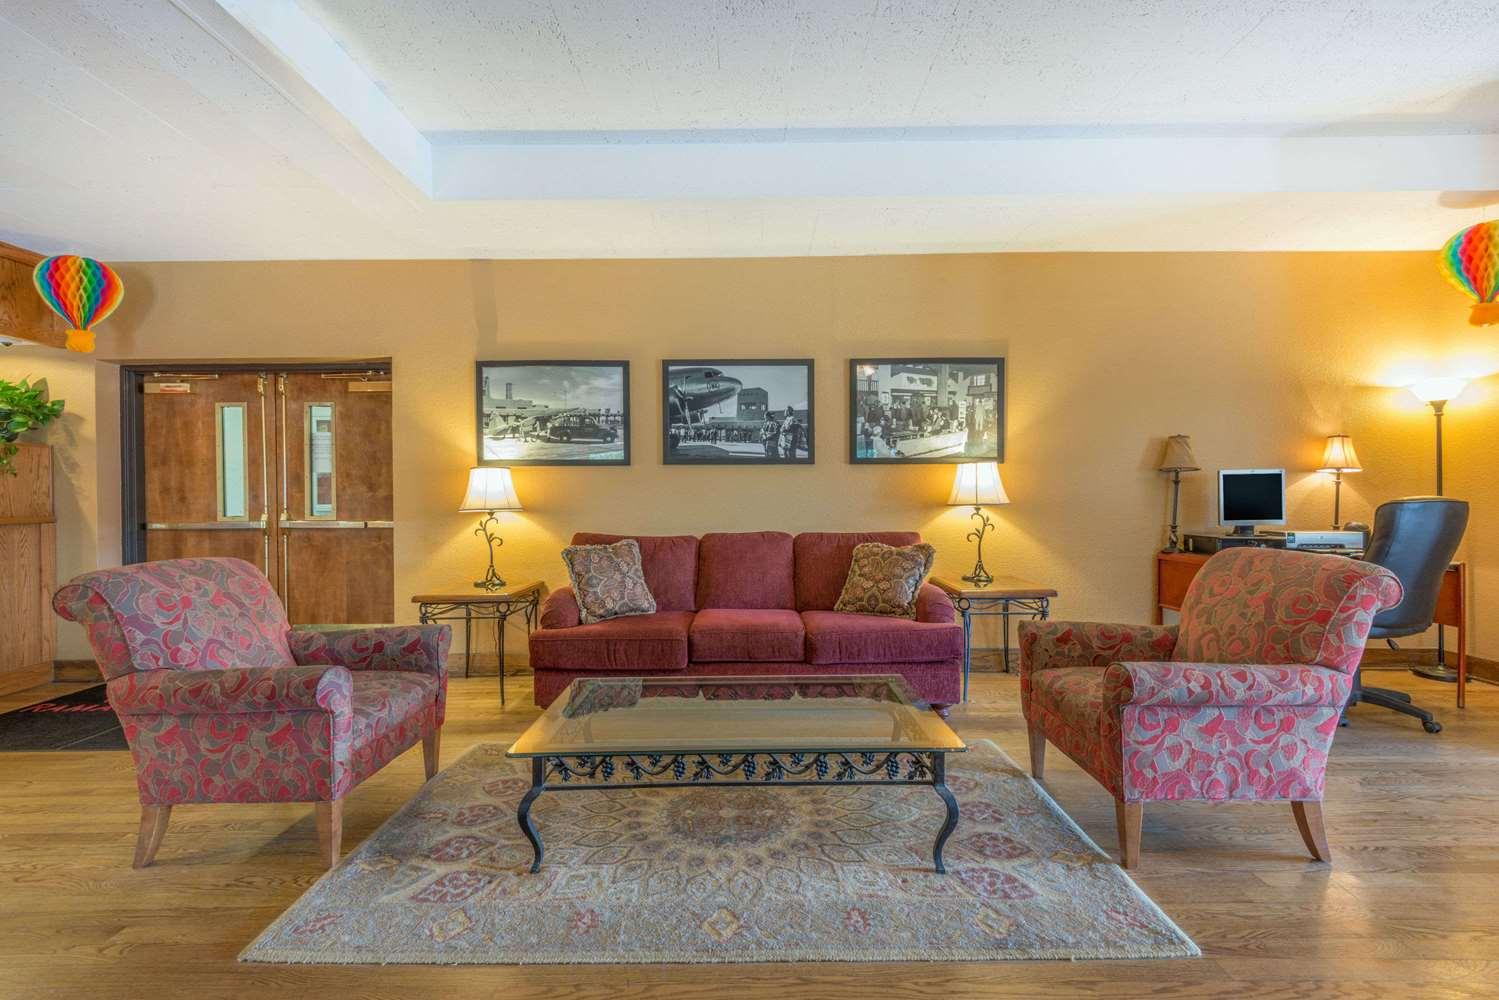 Ramada Hotel Airport Albuquerque, NM - See Discounts